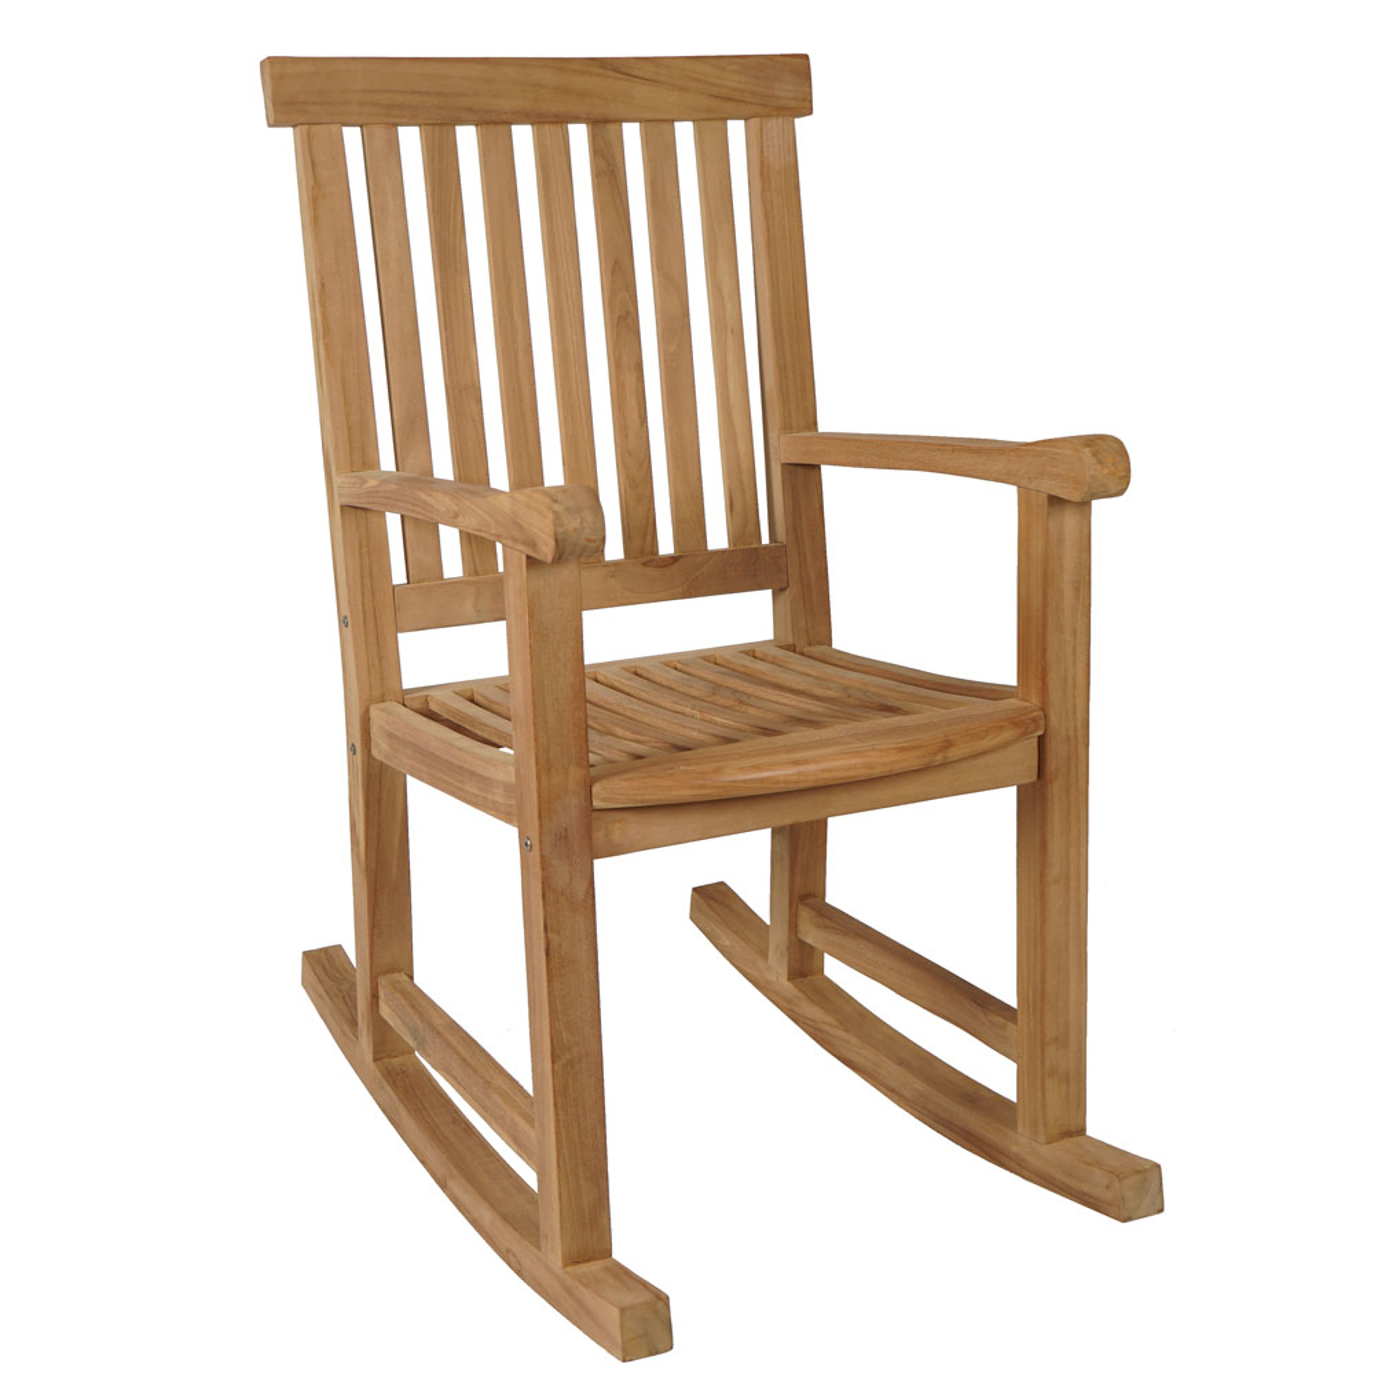 kmh teak schaukelstuhl schwingstuhl relaxstuhl. Black Bedroom Furniture Sets. Home Design Ideas